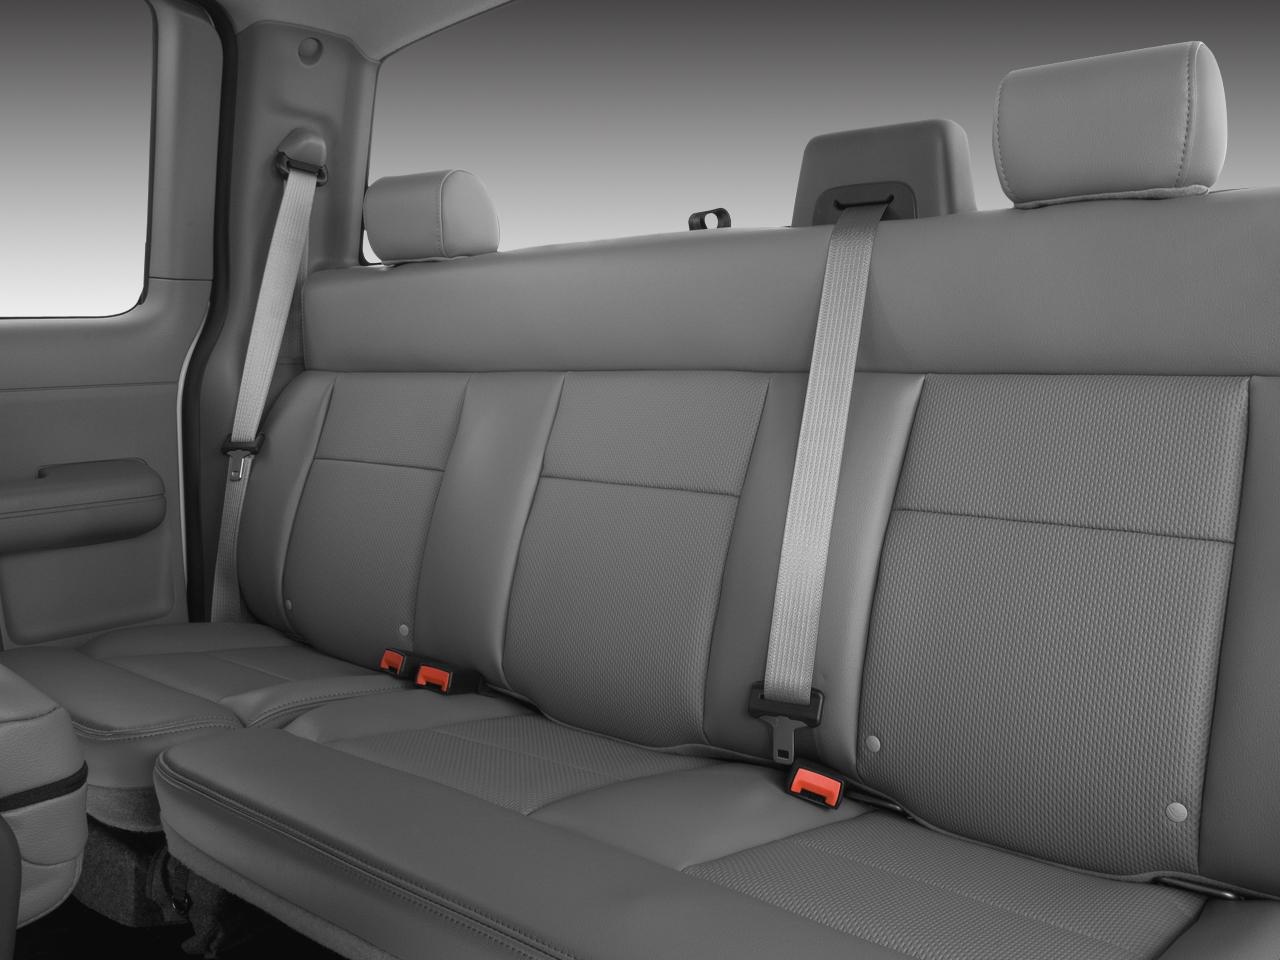 power packed test fleet test drive cars automobile. Black Bedroom Furniture Sets. Home Design Ideas